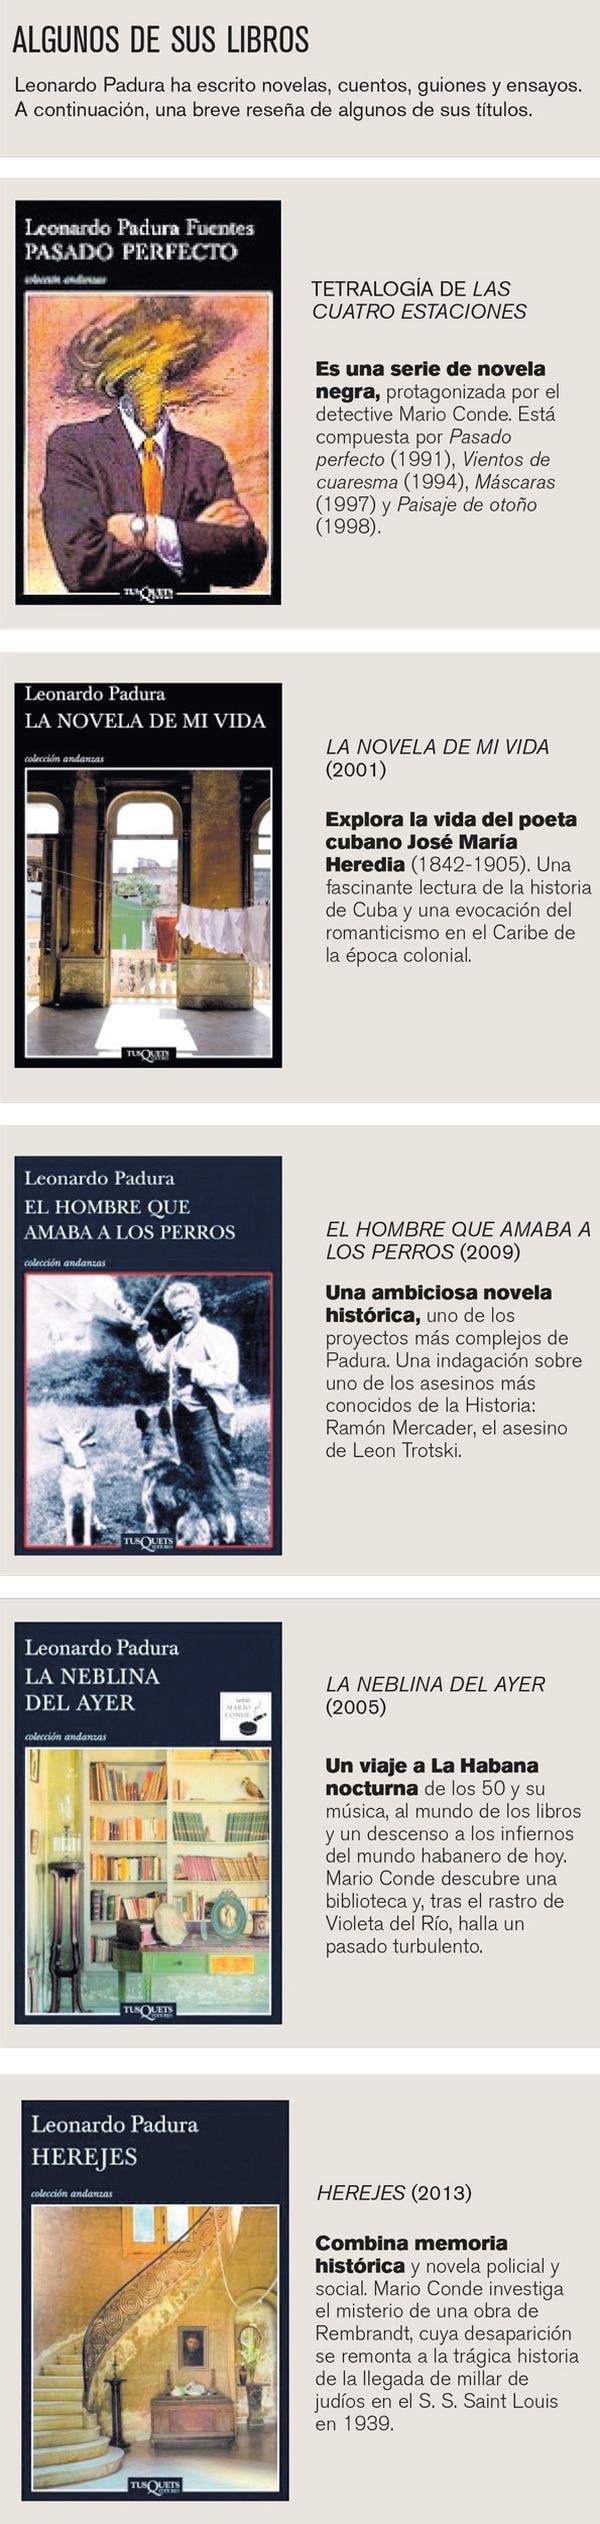 Breve acercamiento a la obra de Leonardo Padura